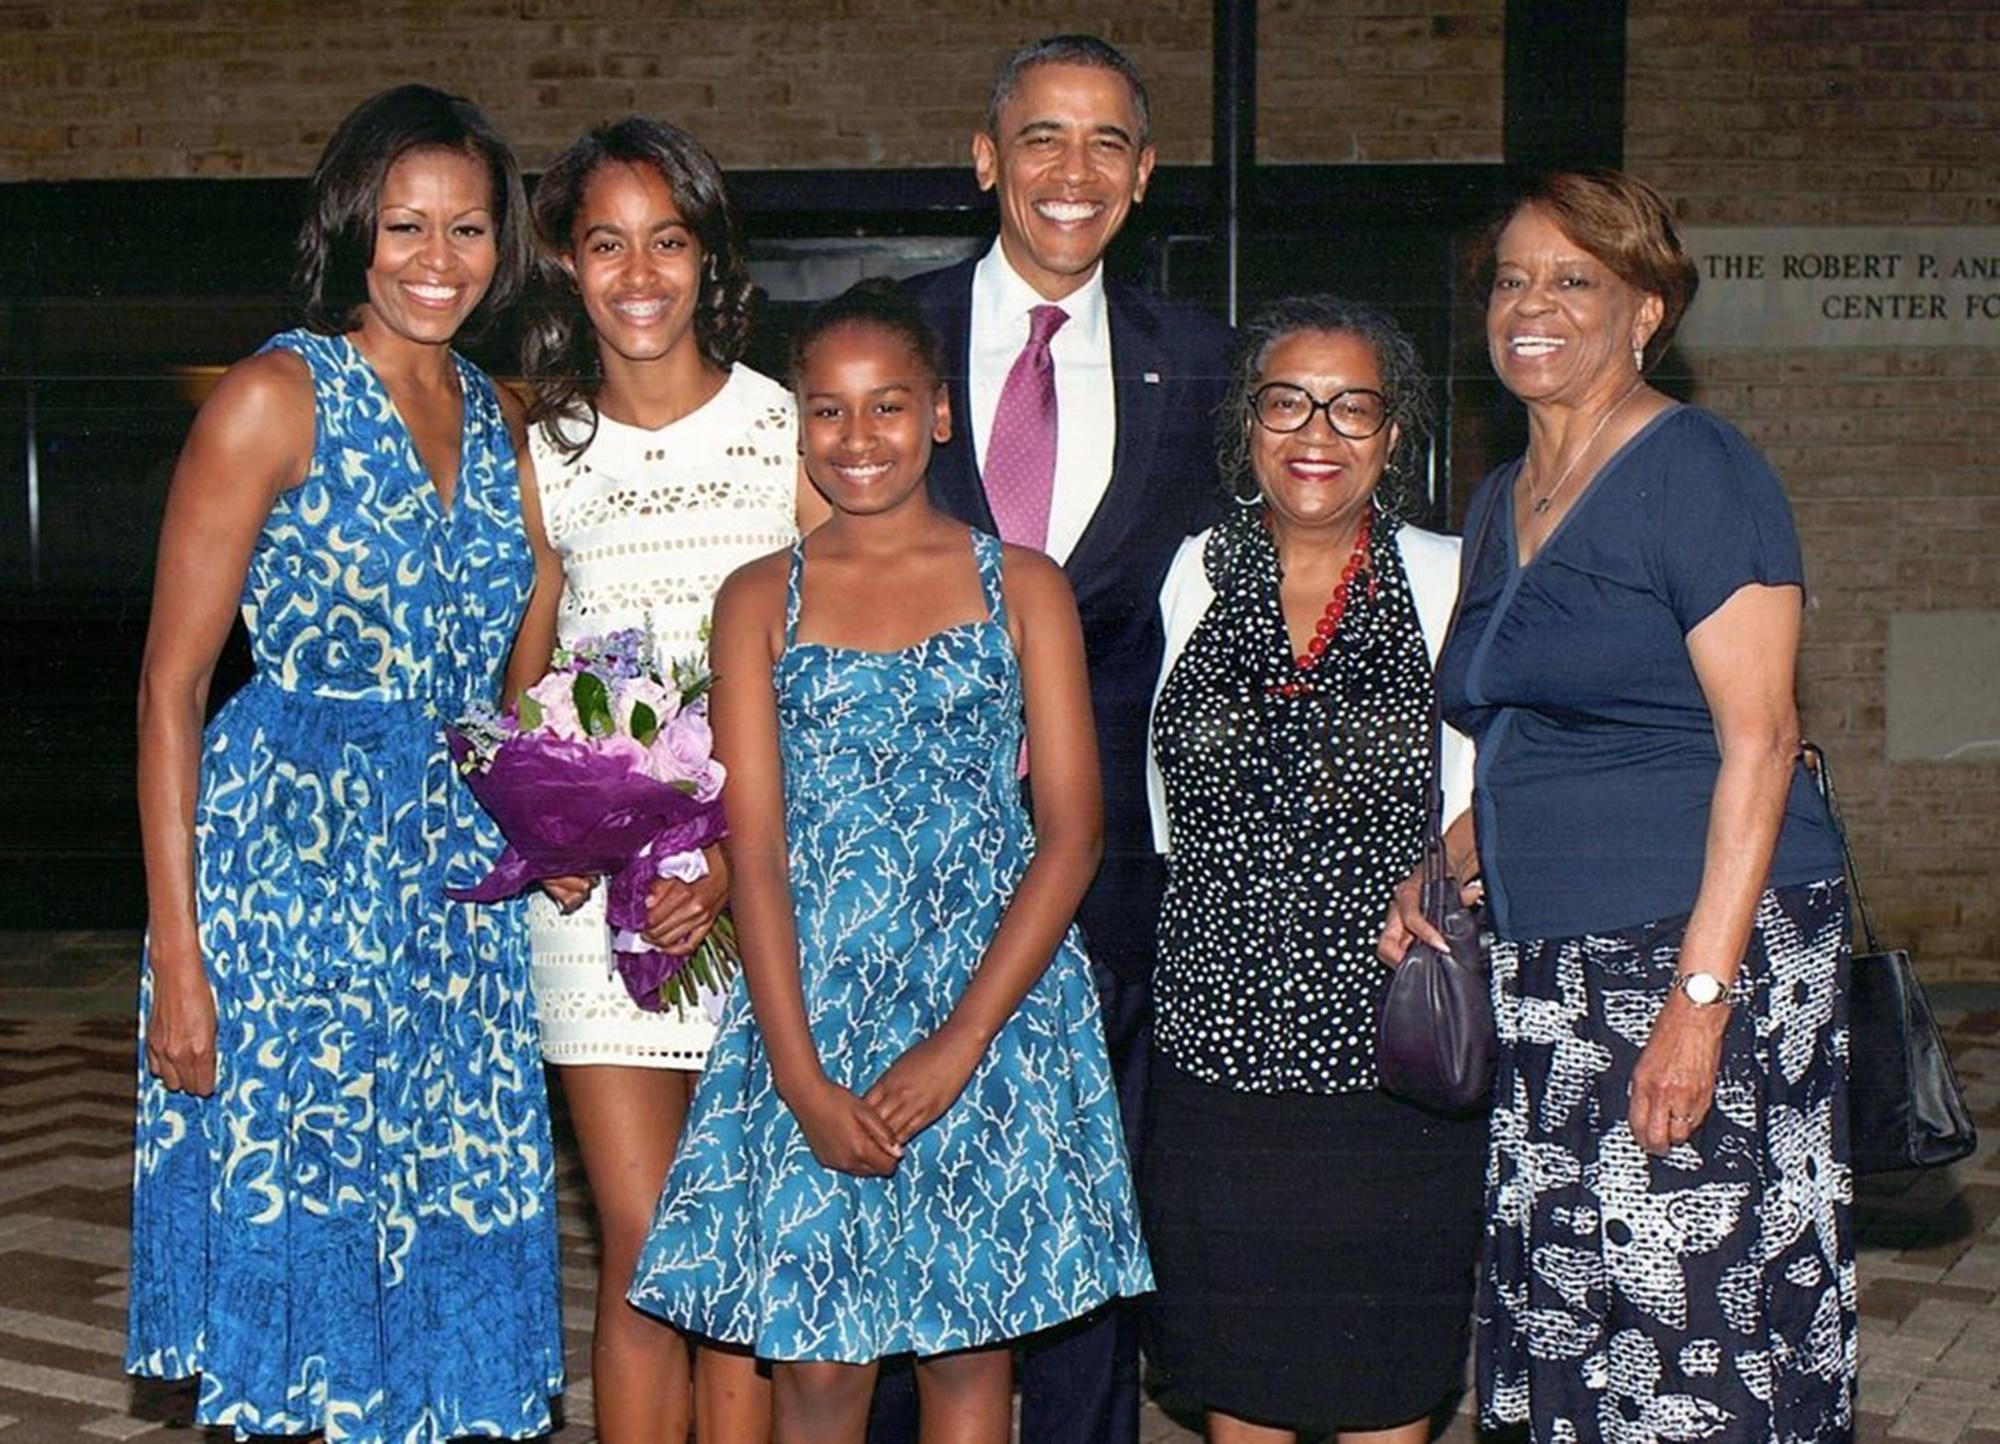 Michelle Malia Sasha Barack Obama Marian Robinson